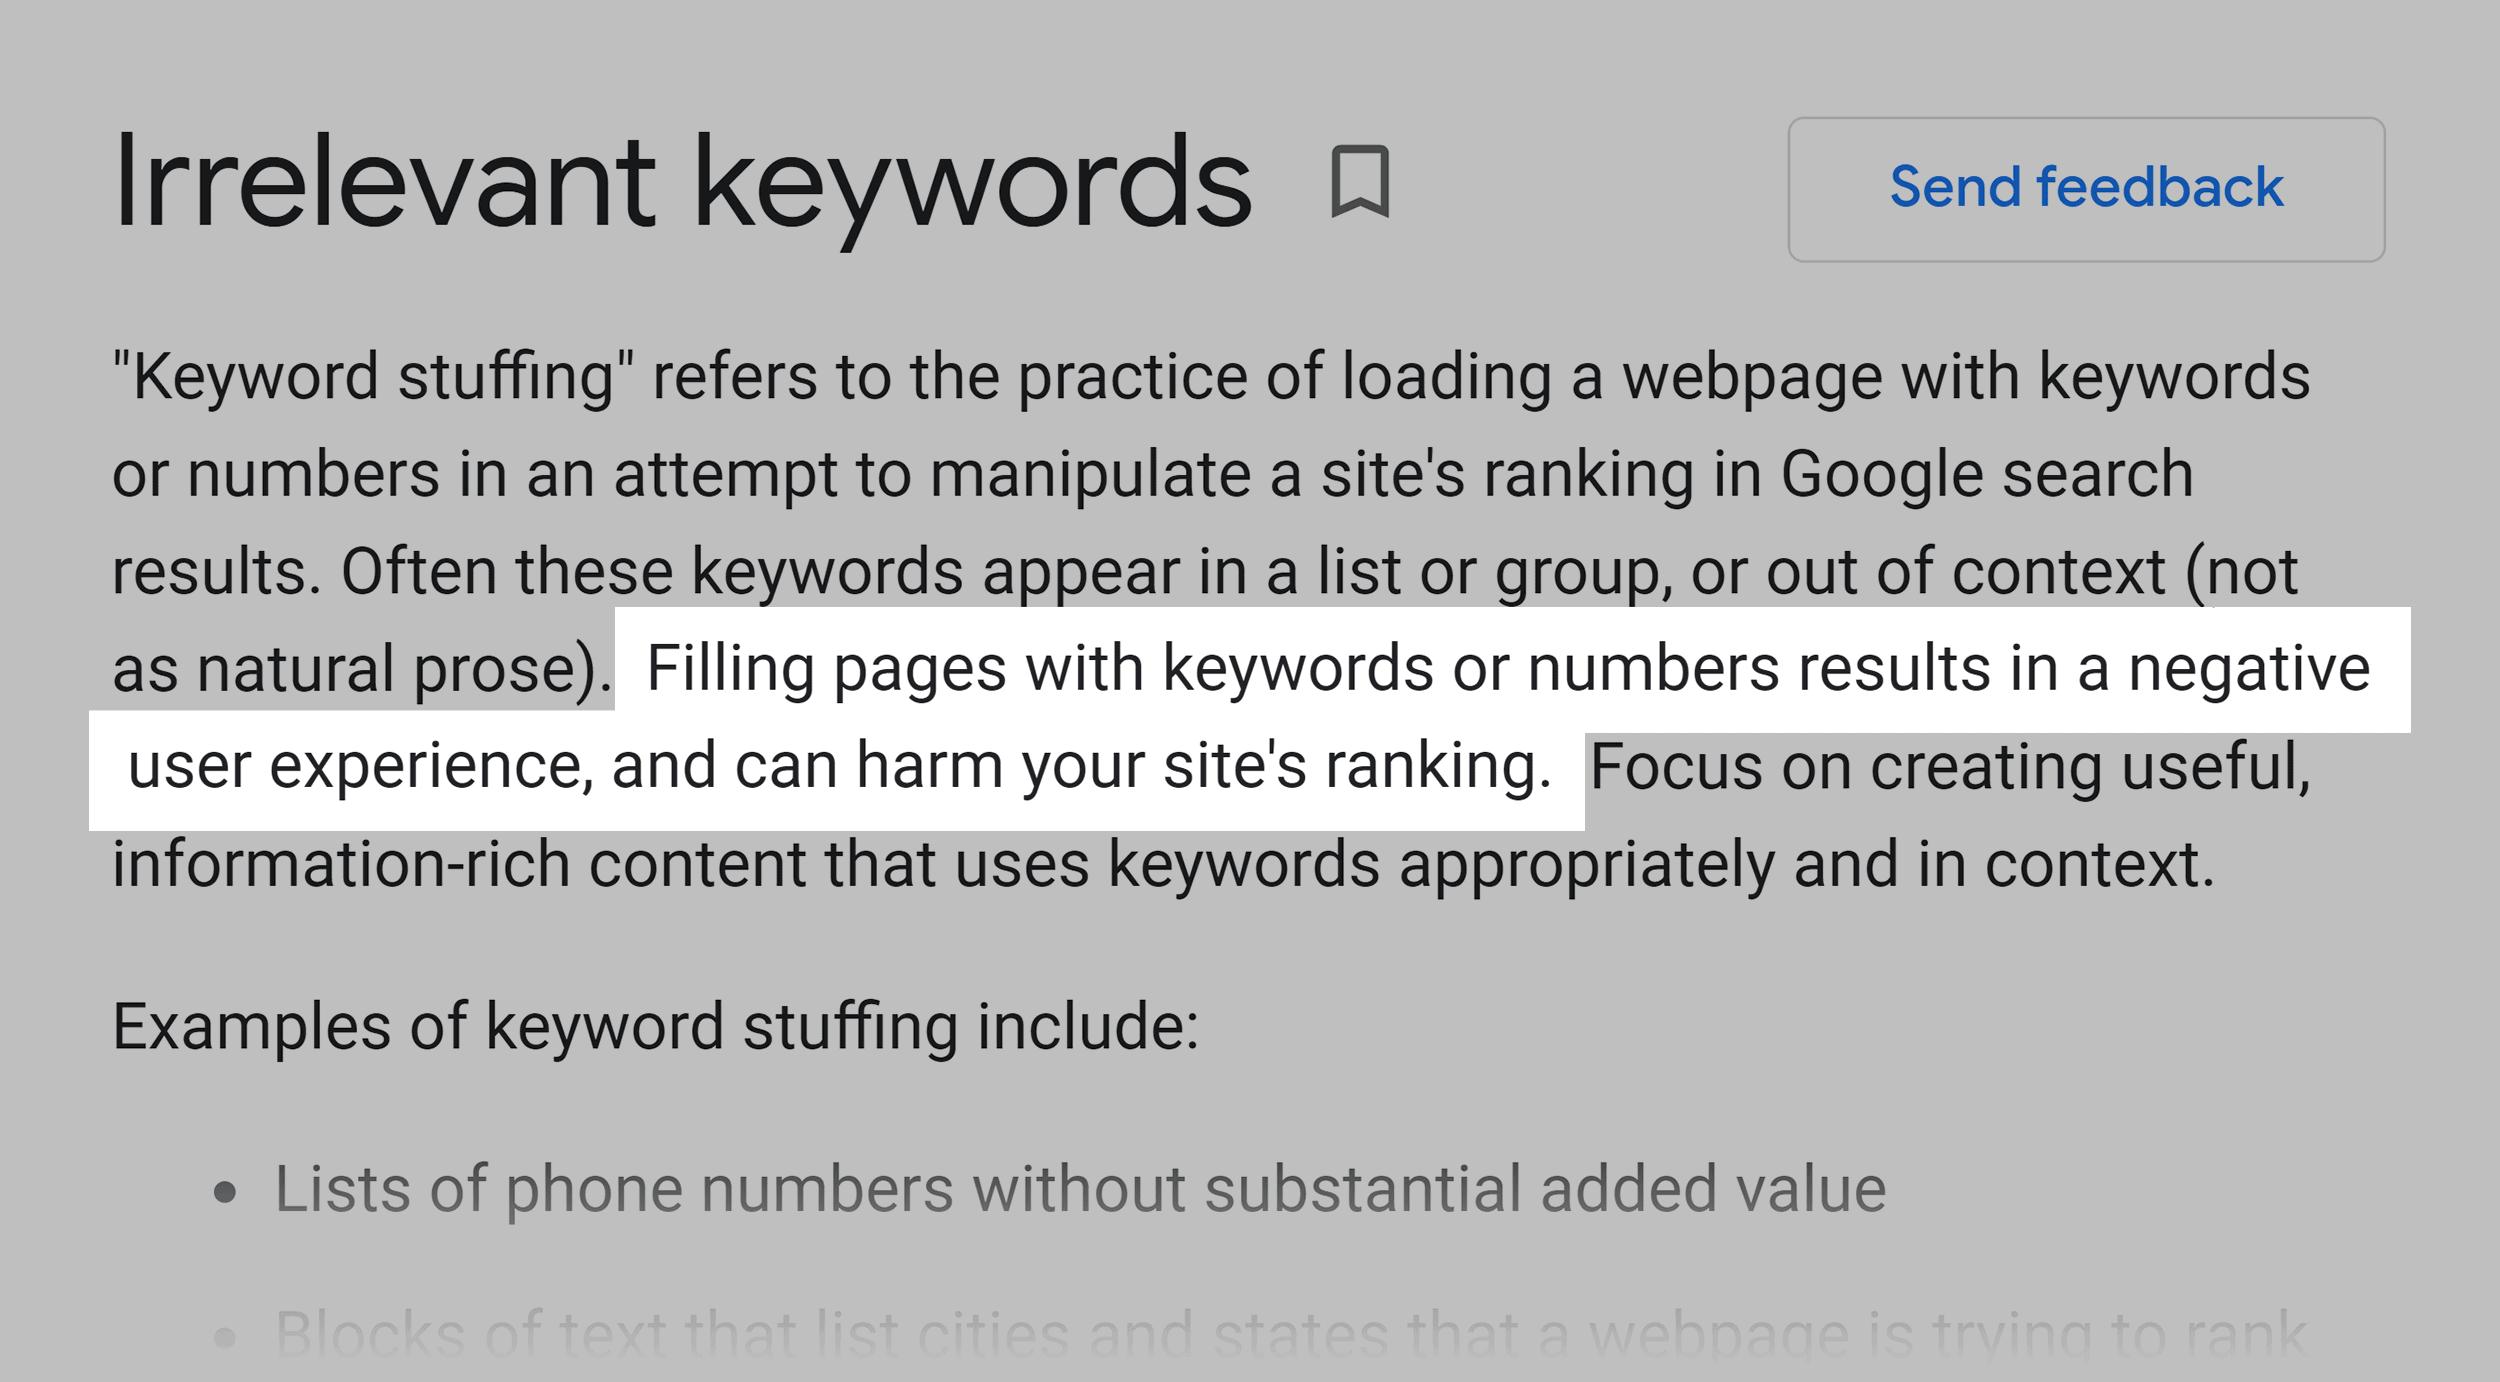 Google guidelines – Irrelevant keywords